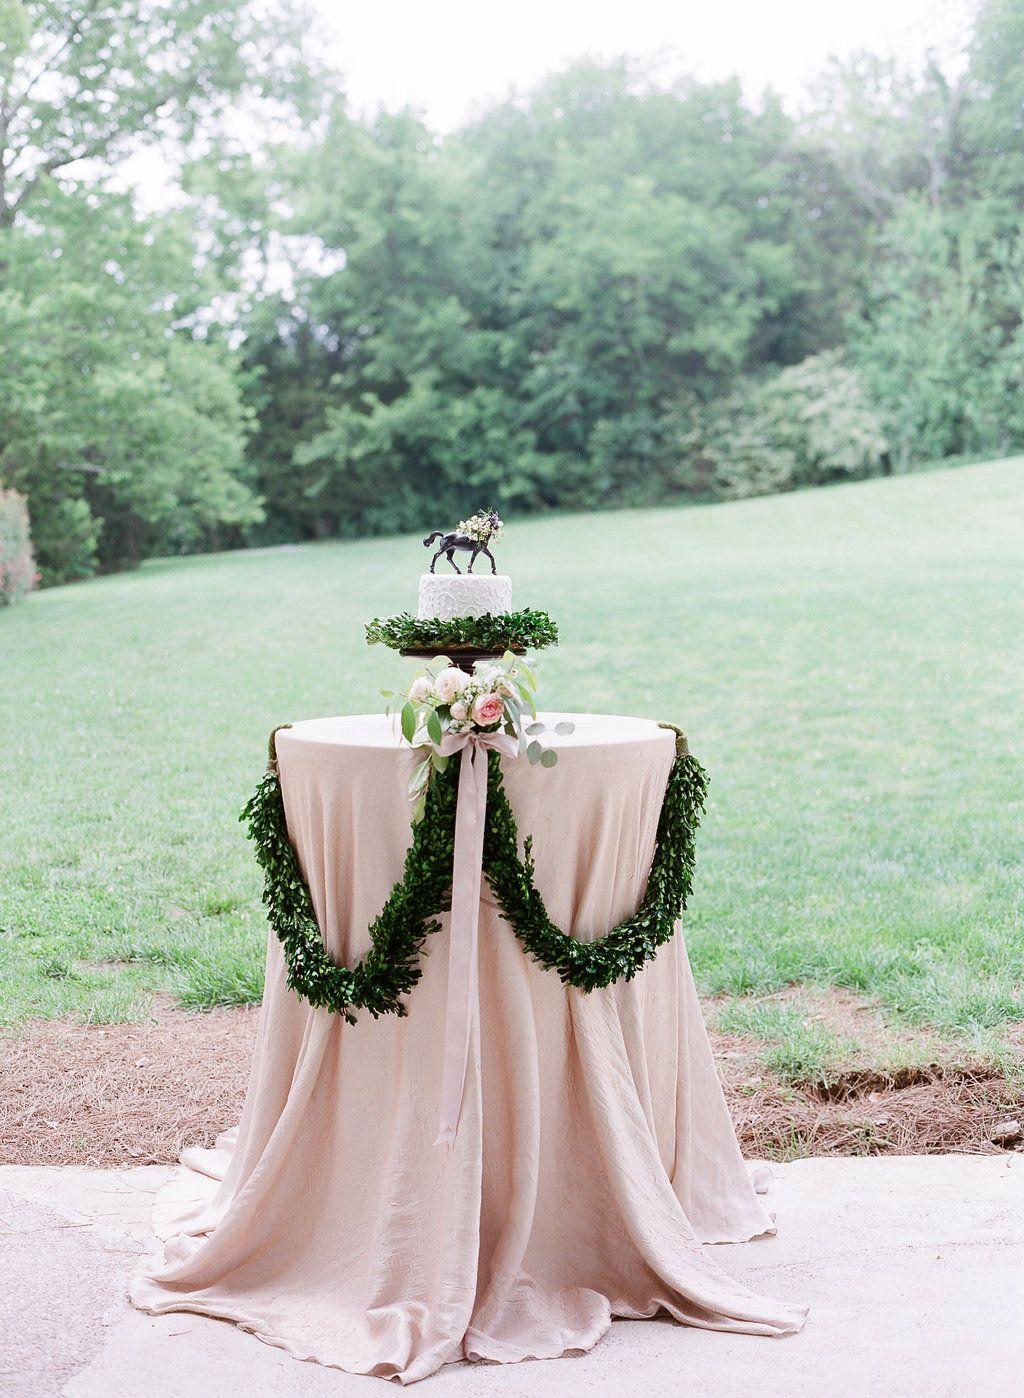 When all you need is that 1 stunner of a cake #cedarwoodweddings Equestrian Bridal Shoot at Cedarwood | Cedarwood Weddings